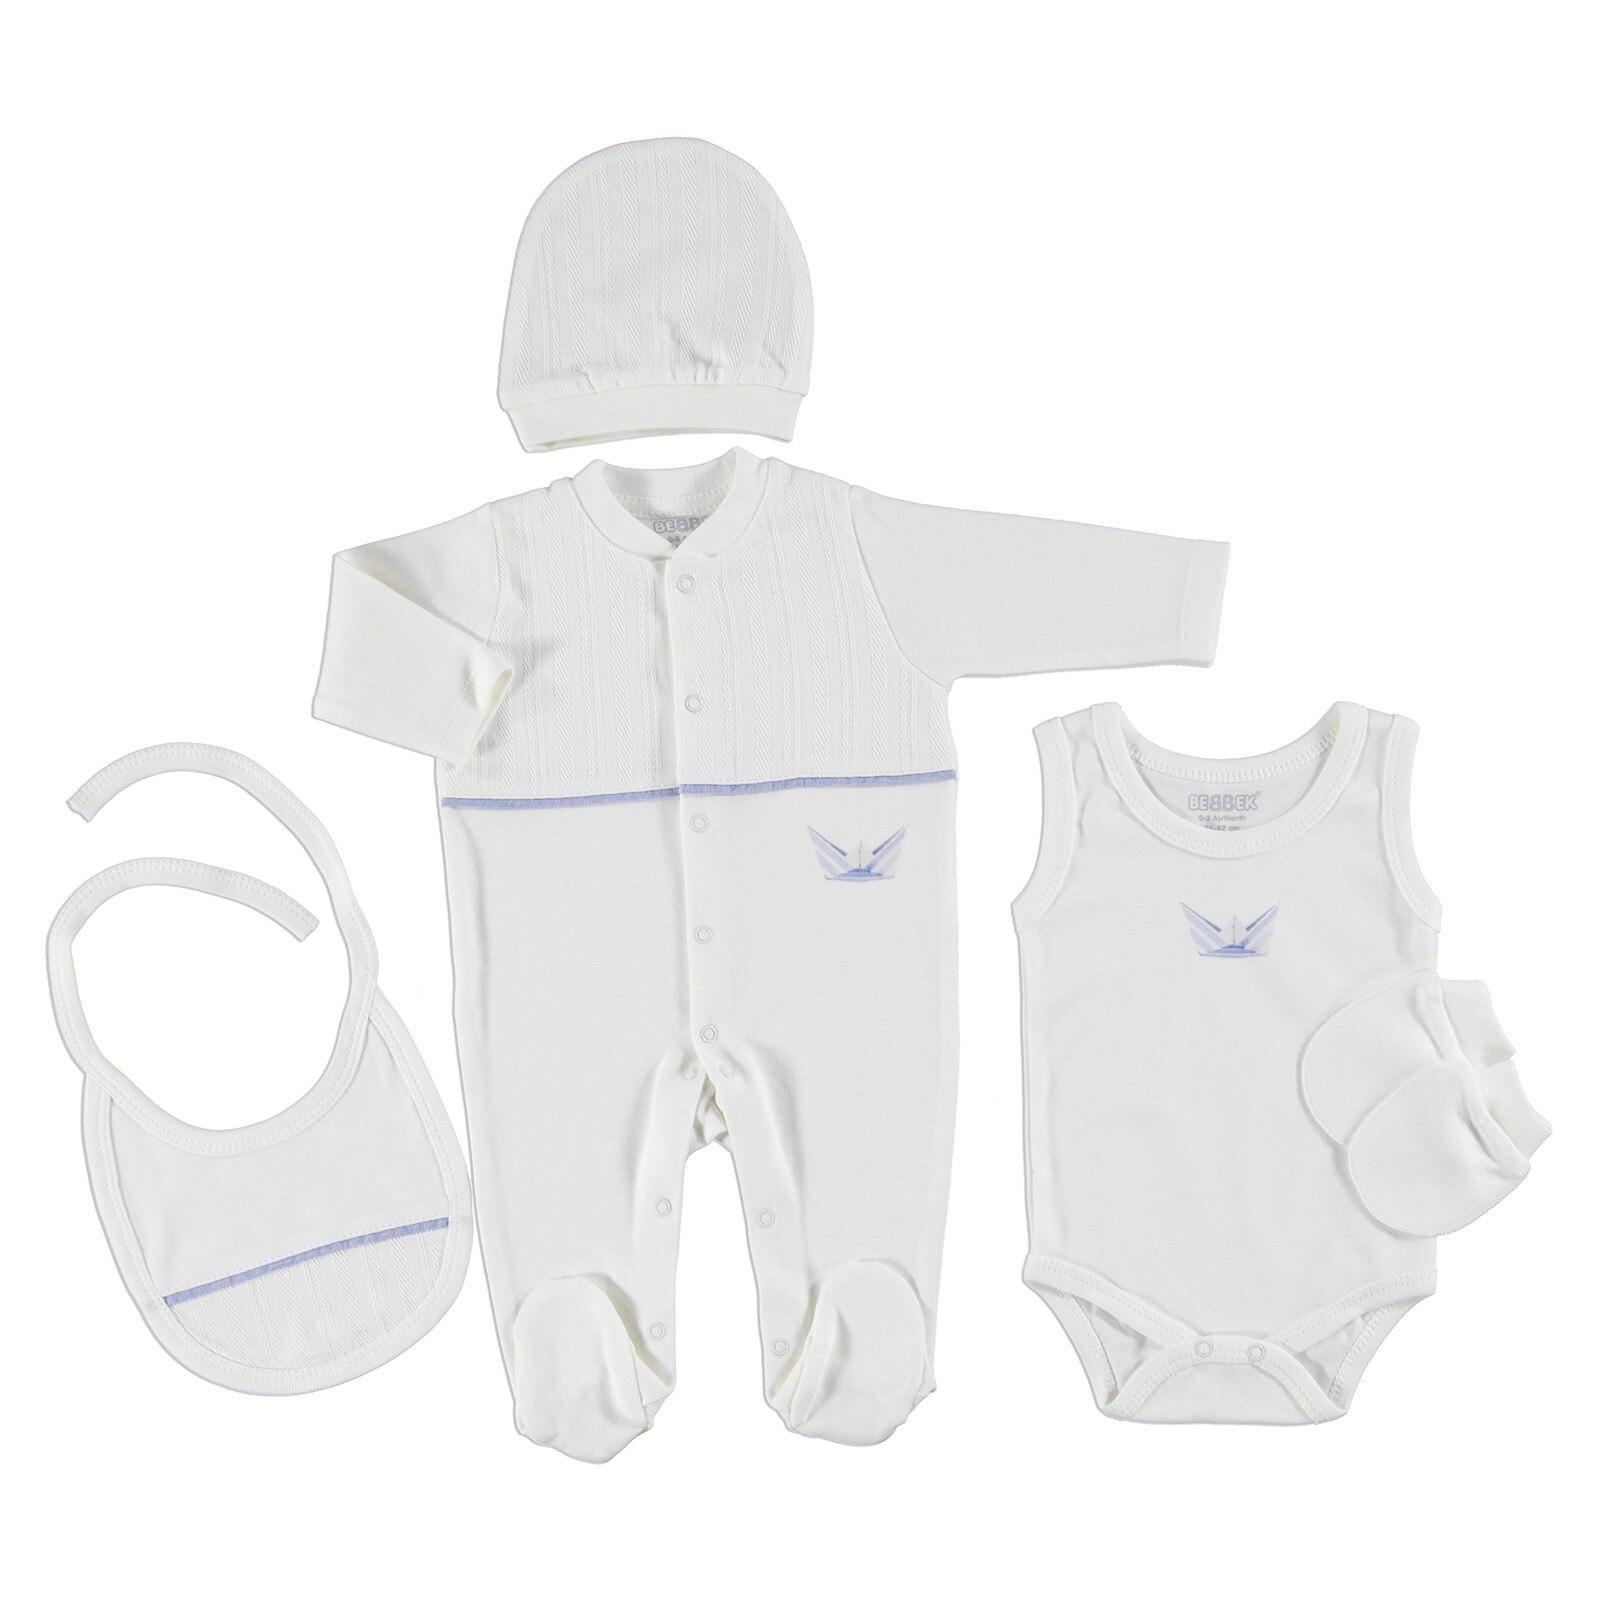 Ebebek Bebbek Sea Adventure Newborn Baby Hospital Pack 5 Pcs